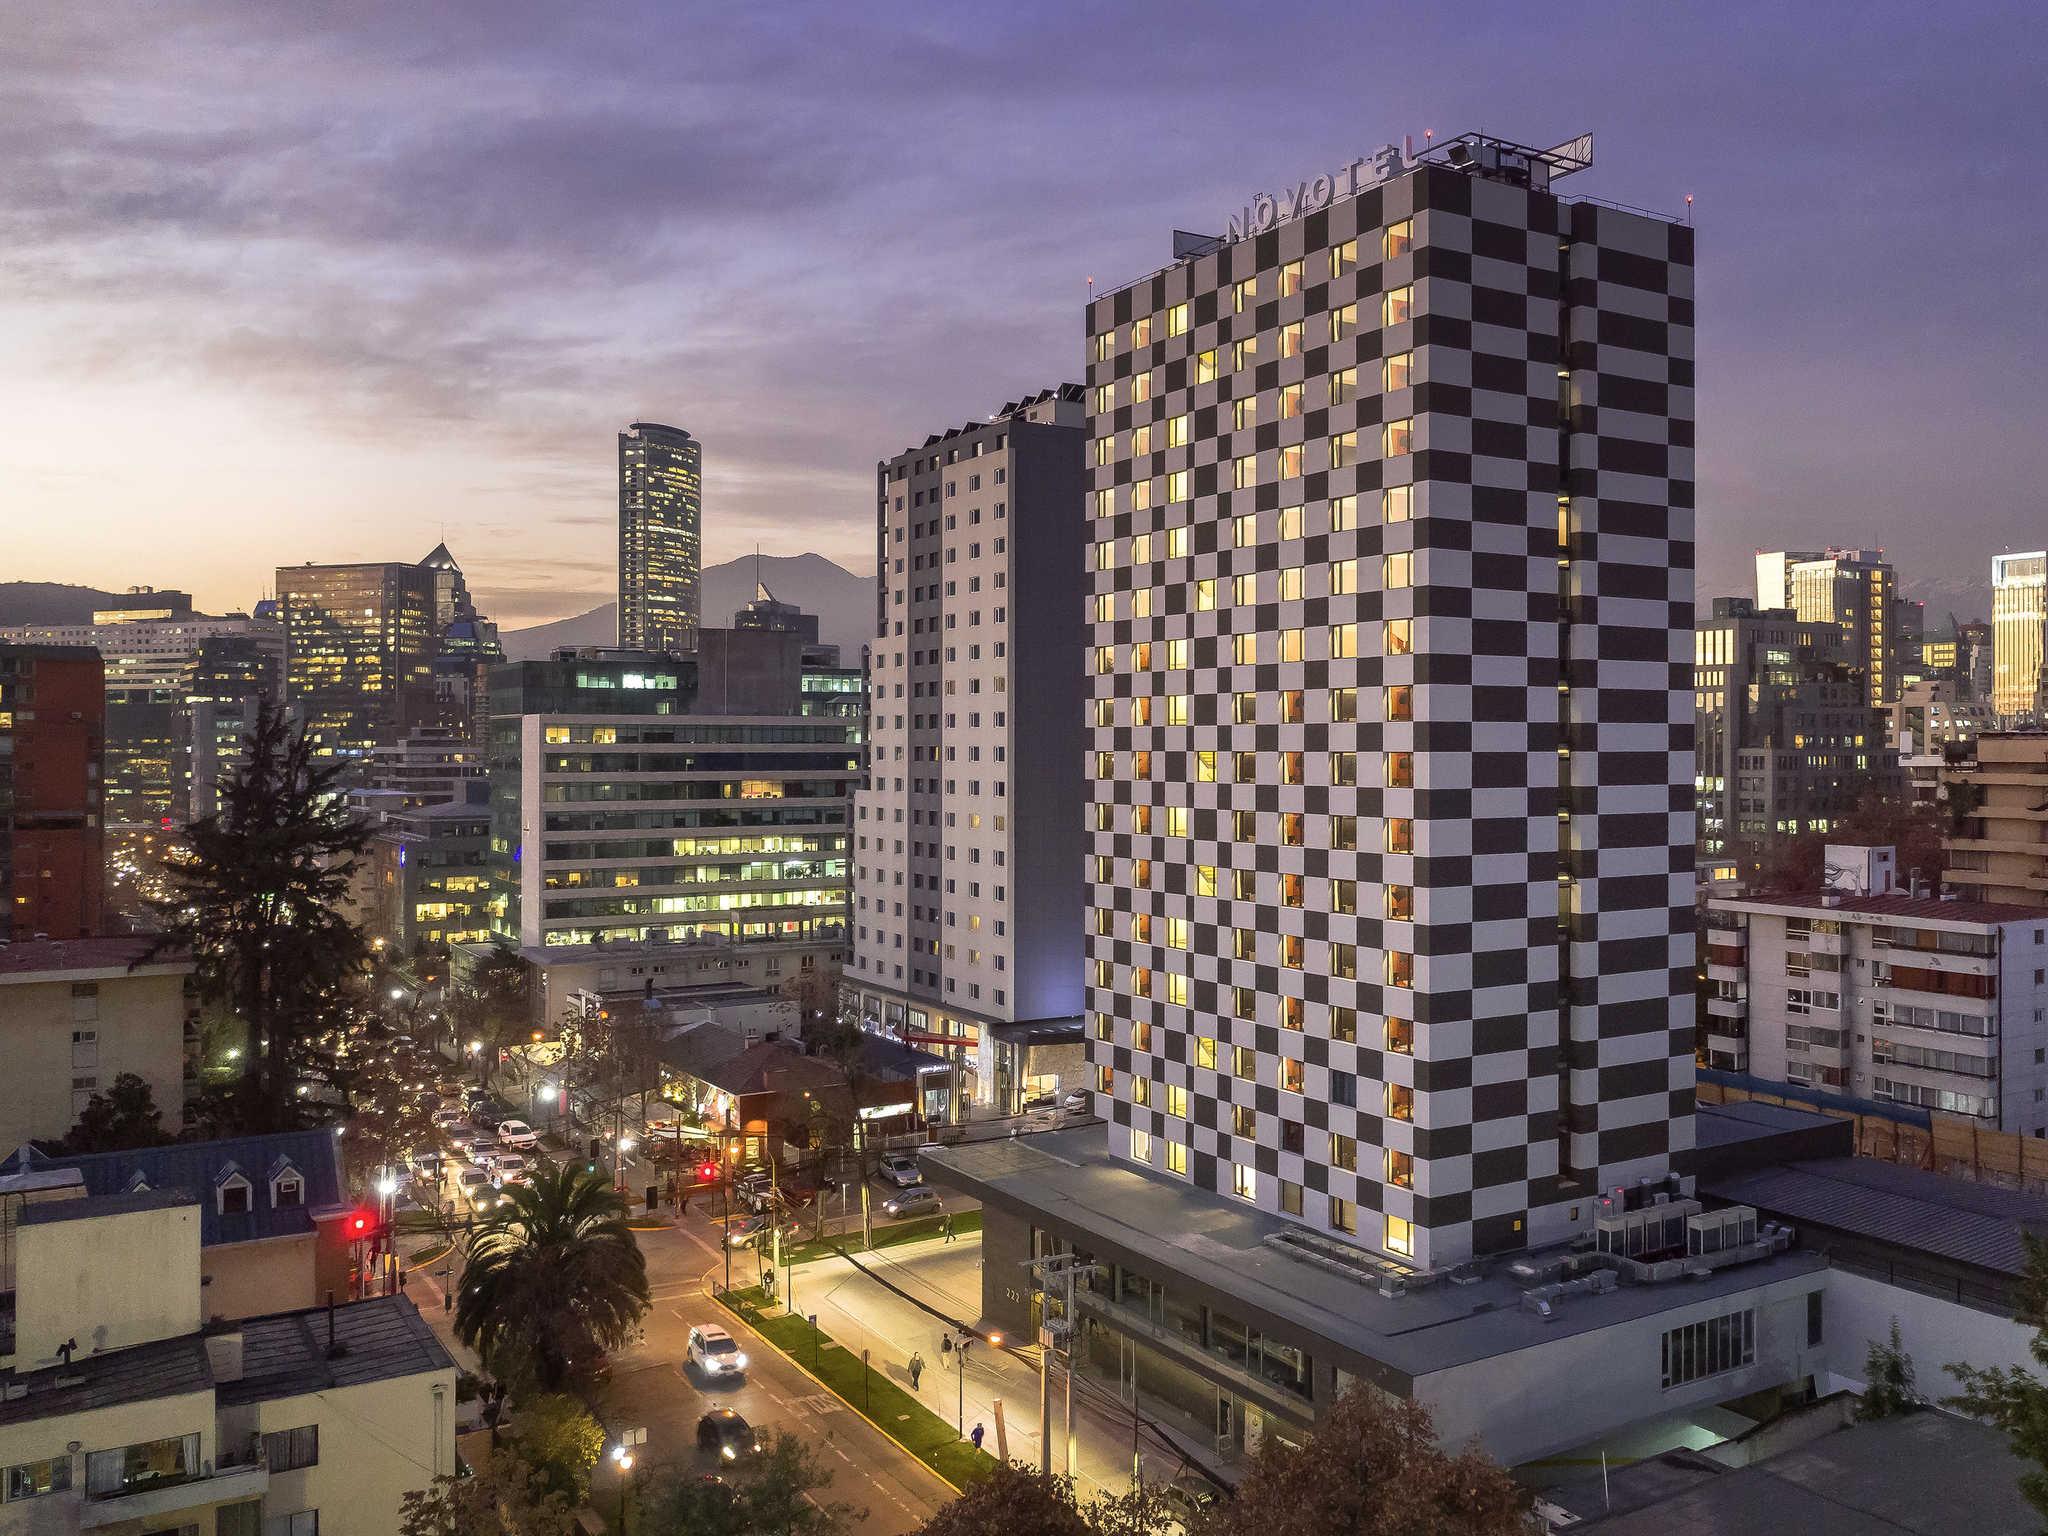 Hotel - Novotel Santiago Providencia (Opening October 2018)